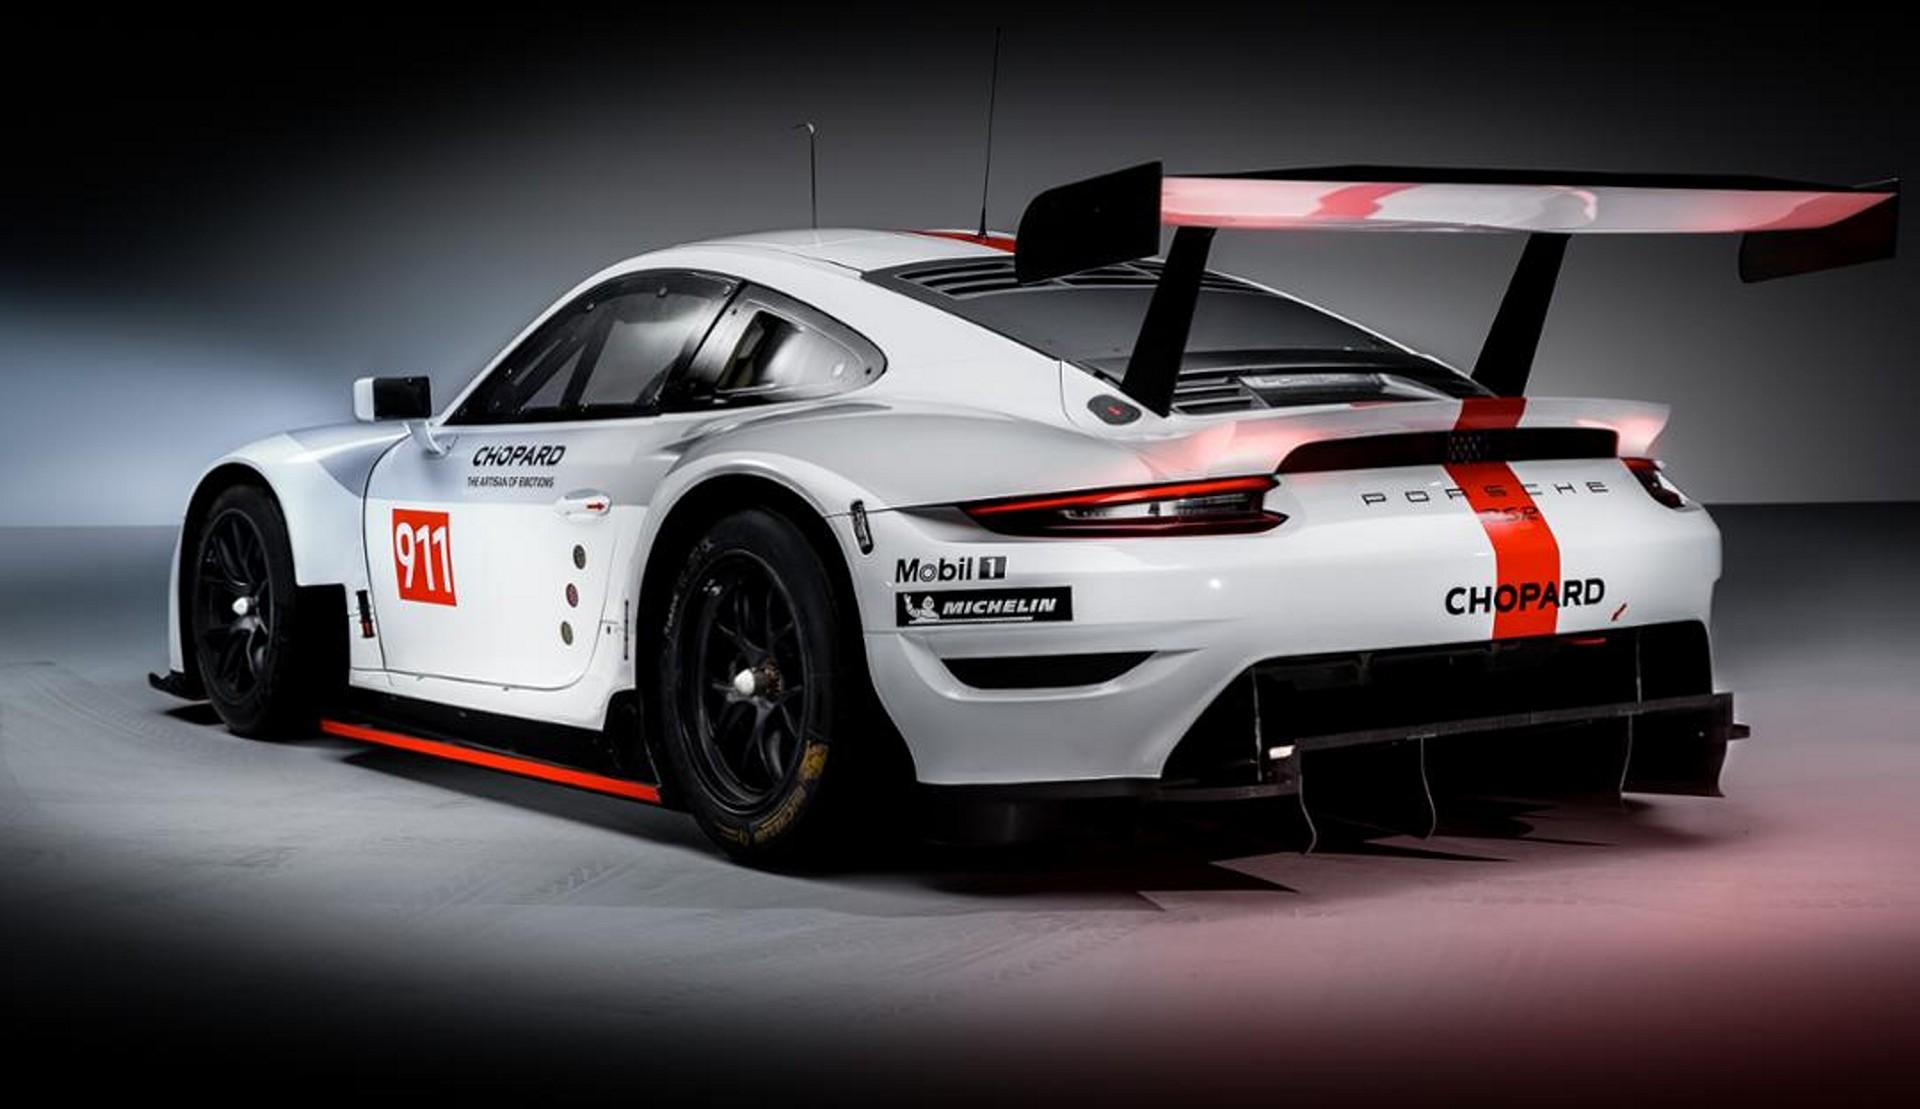 Porsche 911 RSR 2019, listo para seguir dominando con puño de hierro